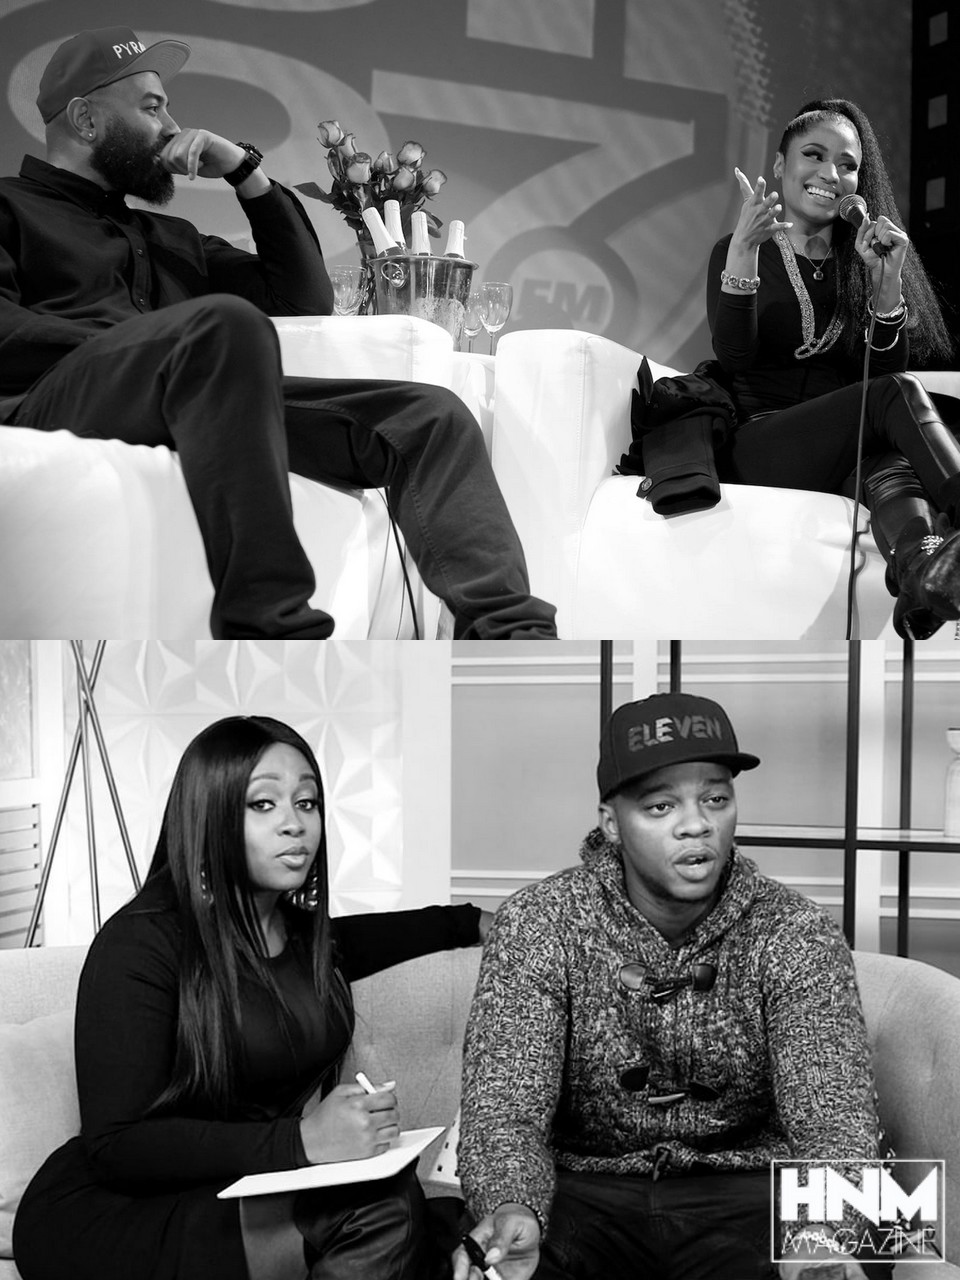 vidéos de Nicki Minaj avoir des relations sexuelles